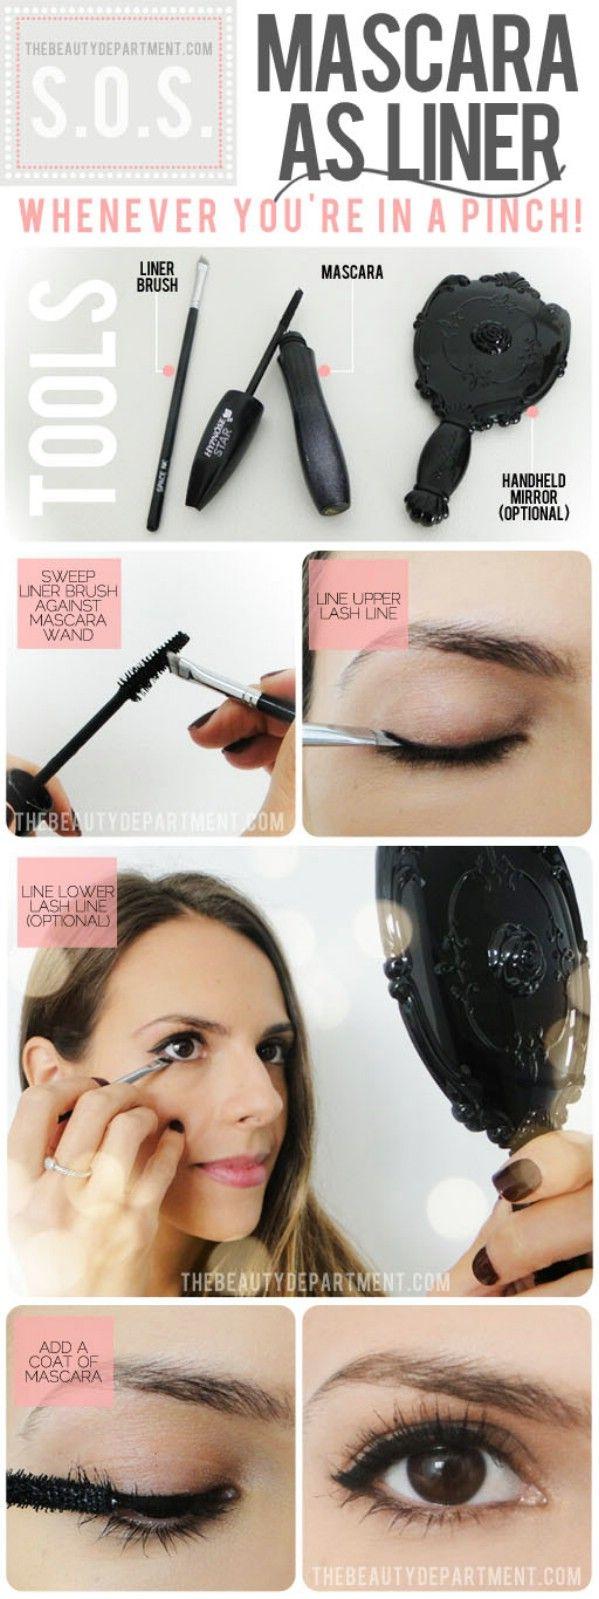 Use Mascara as Eye Liner - 40 DIY Beauty Hacks That Are Borderline Genius